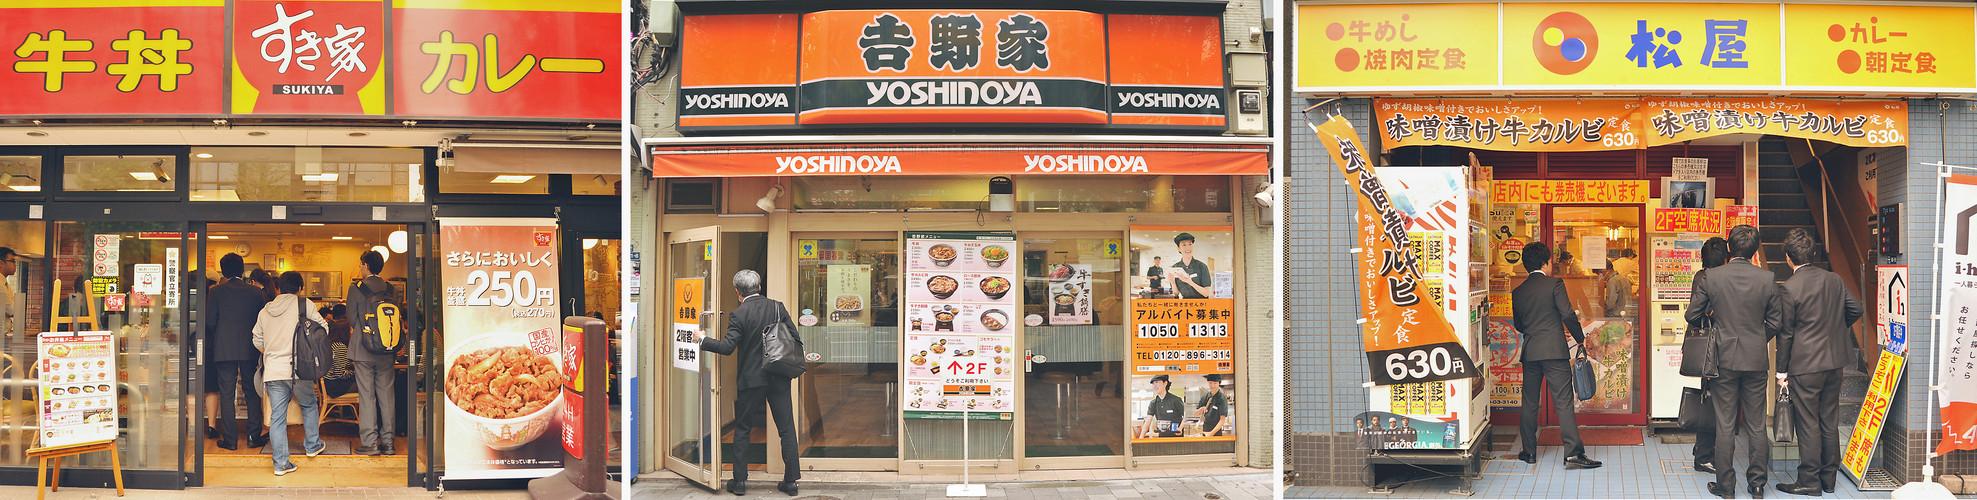 Gyudon restaurants